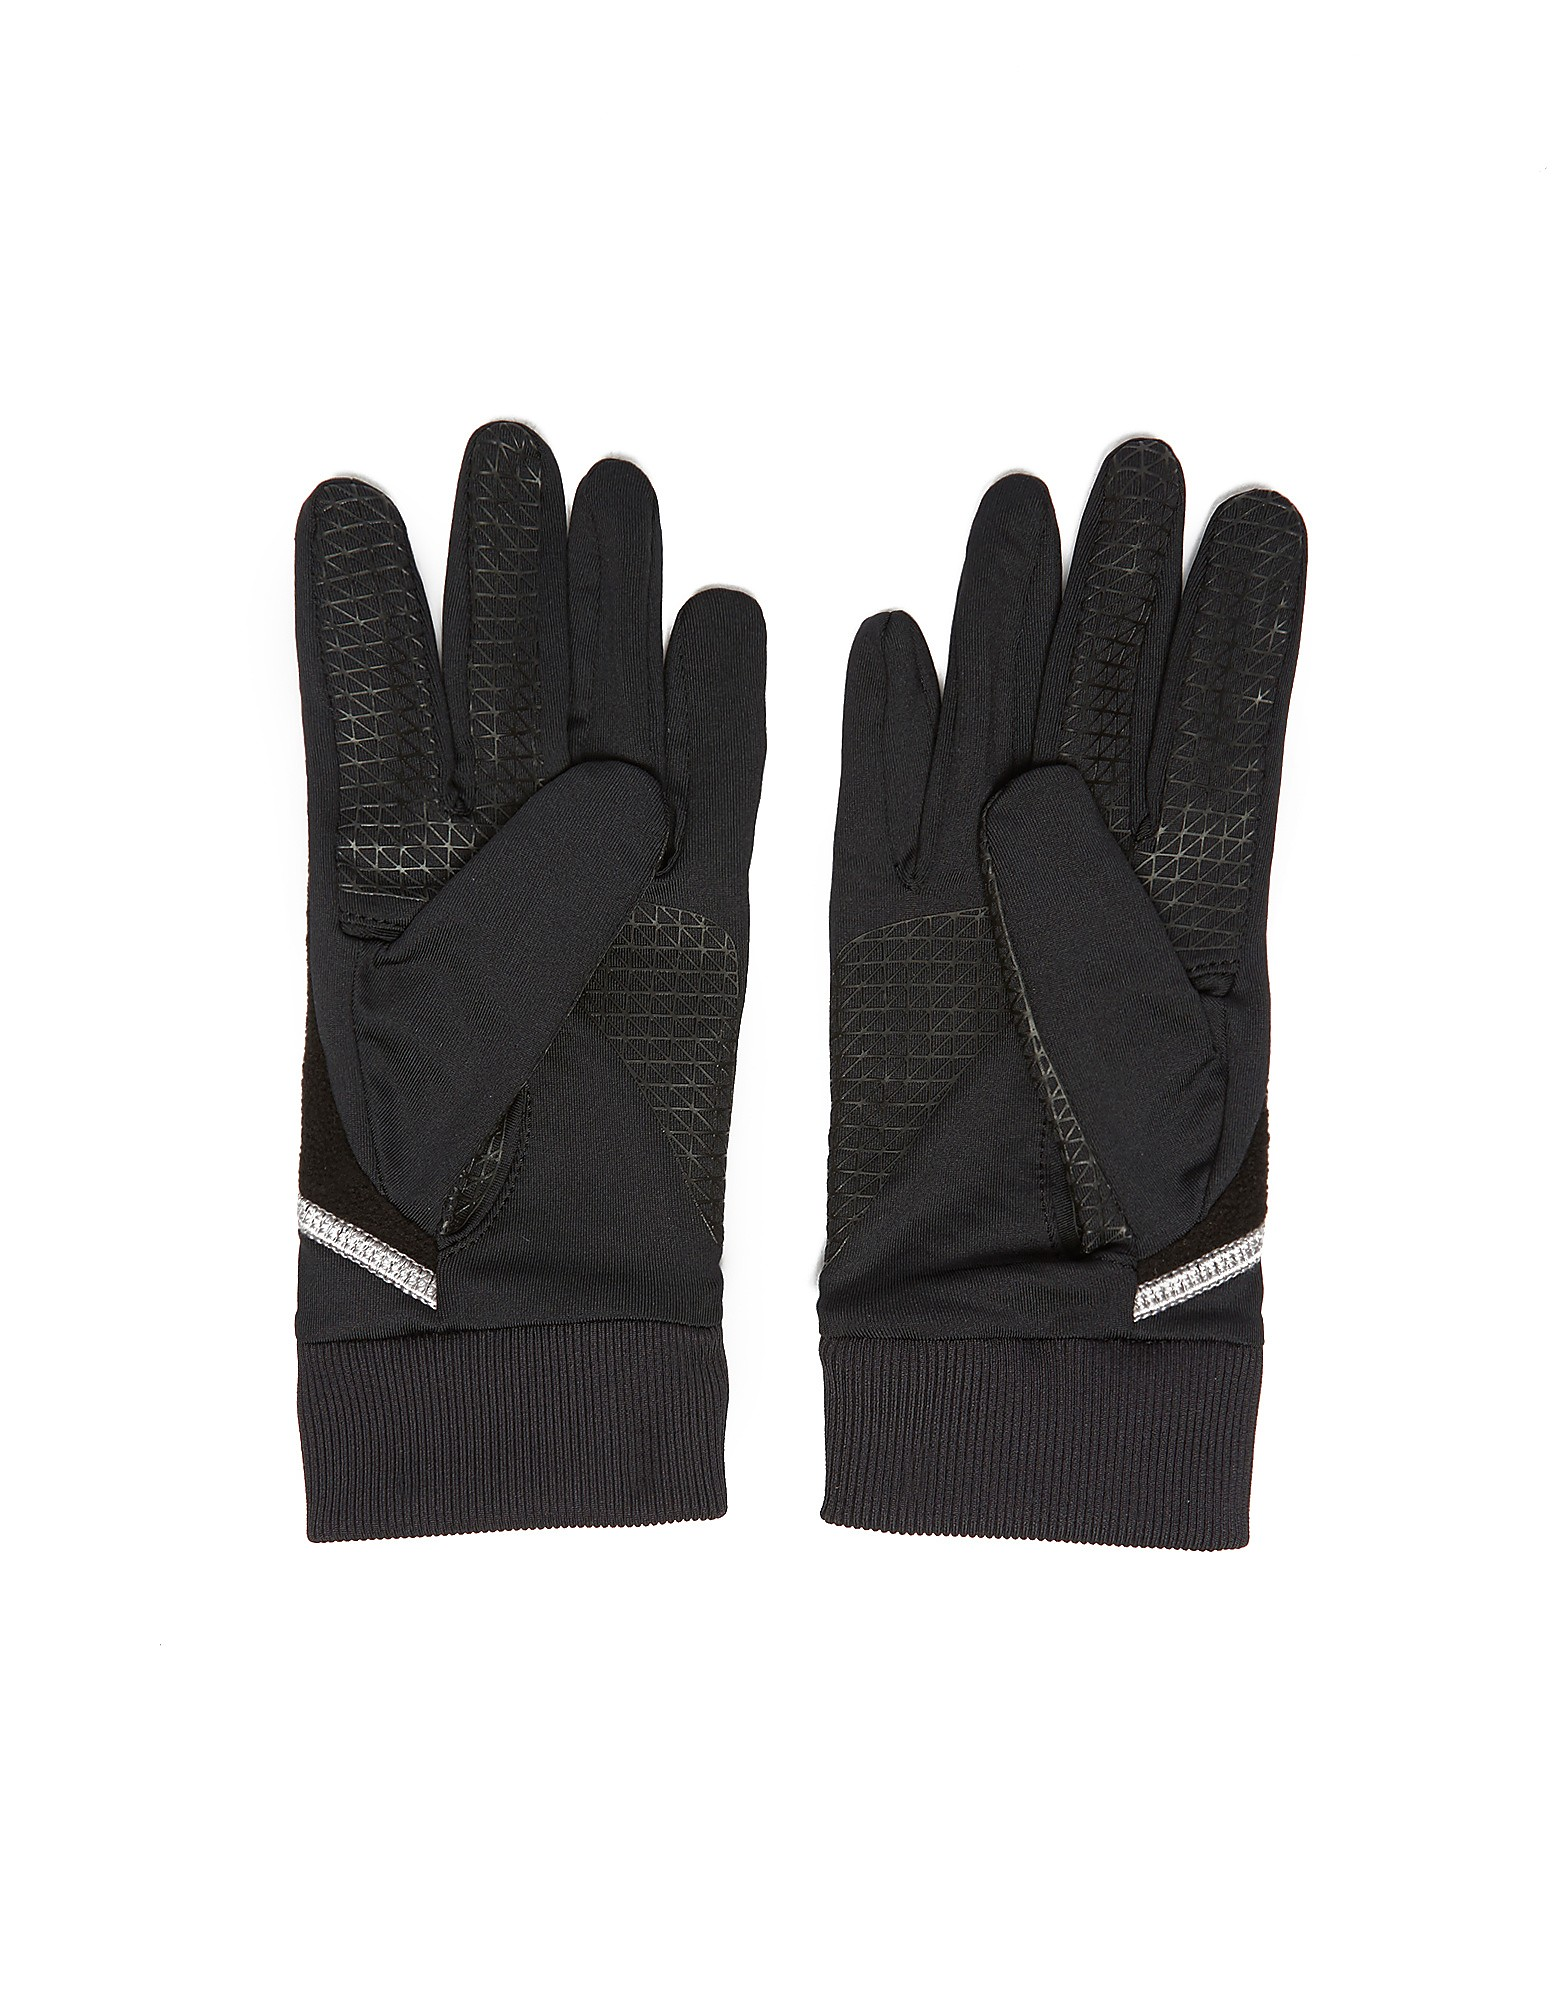 Under Armour Engage ColdGear-handschoenen